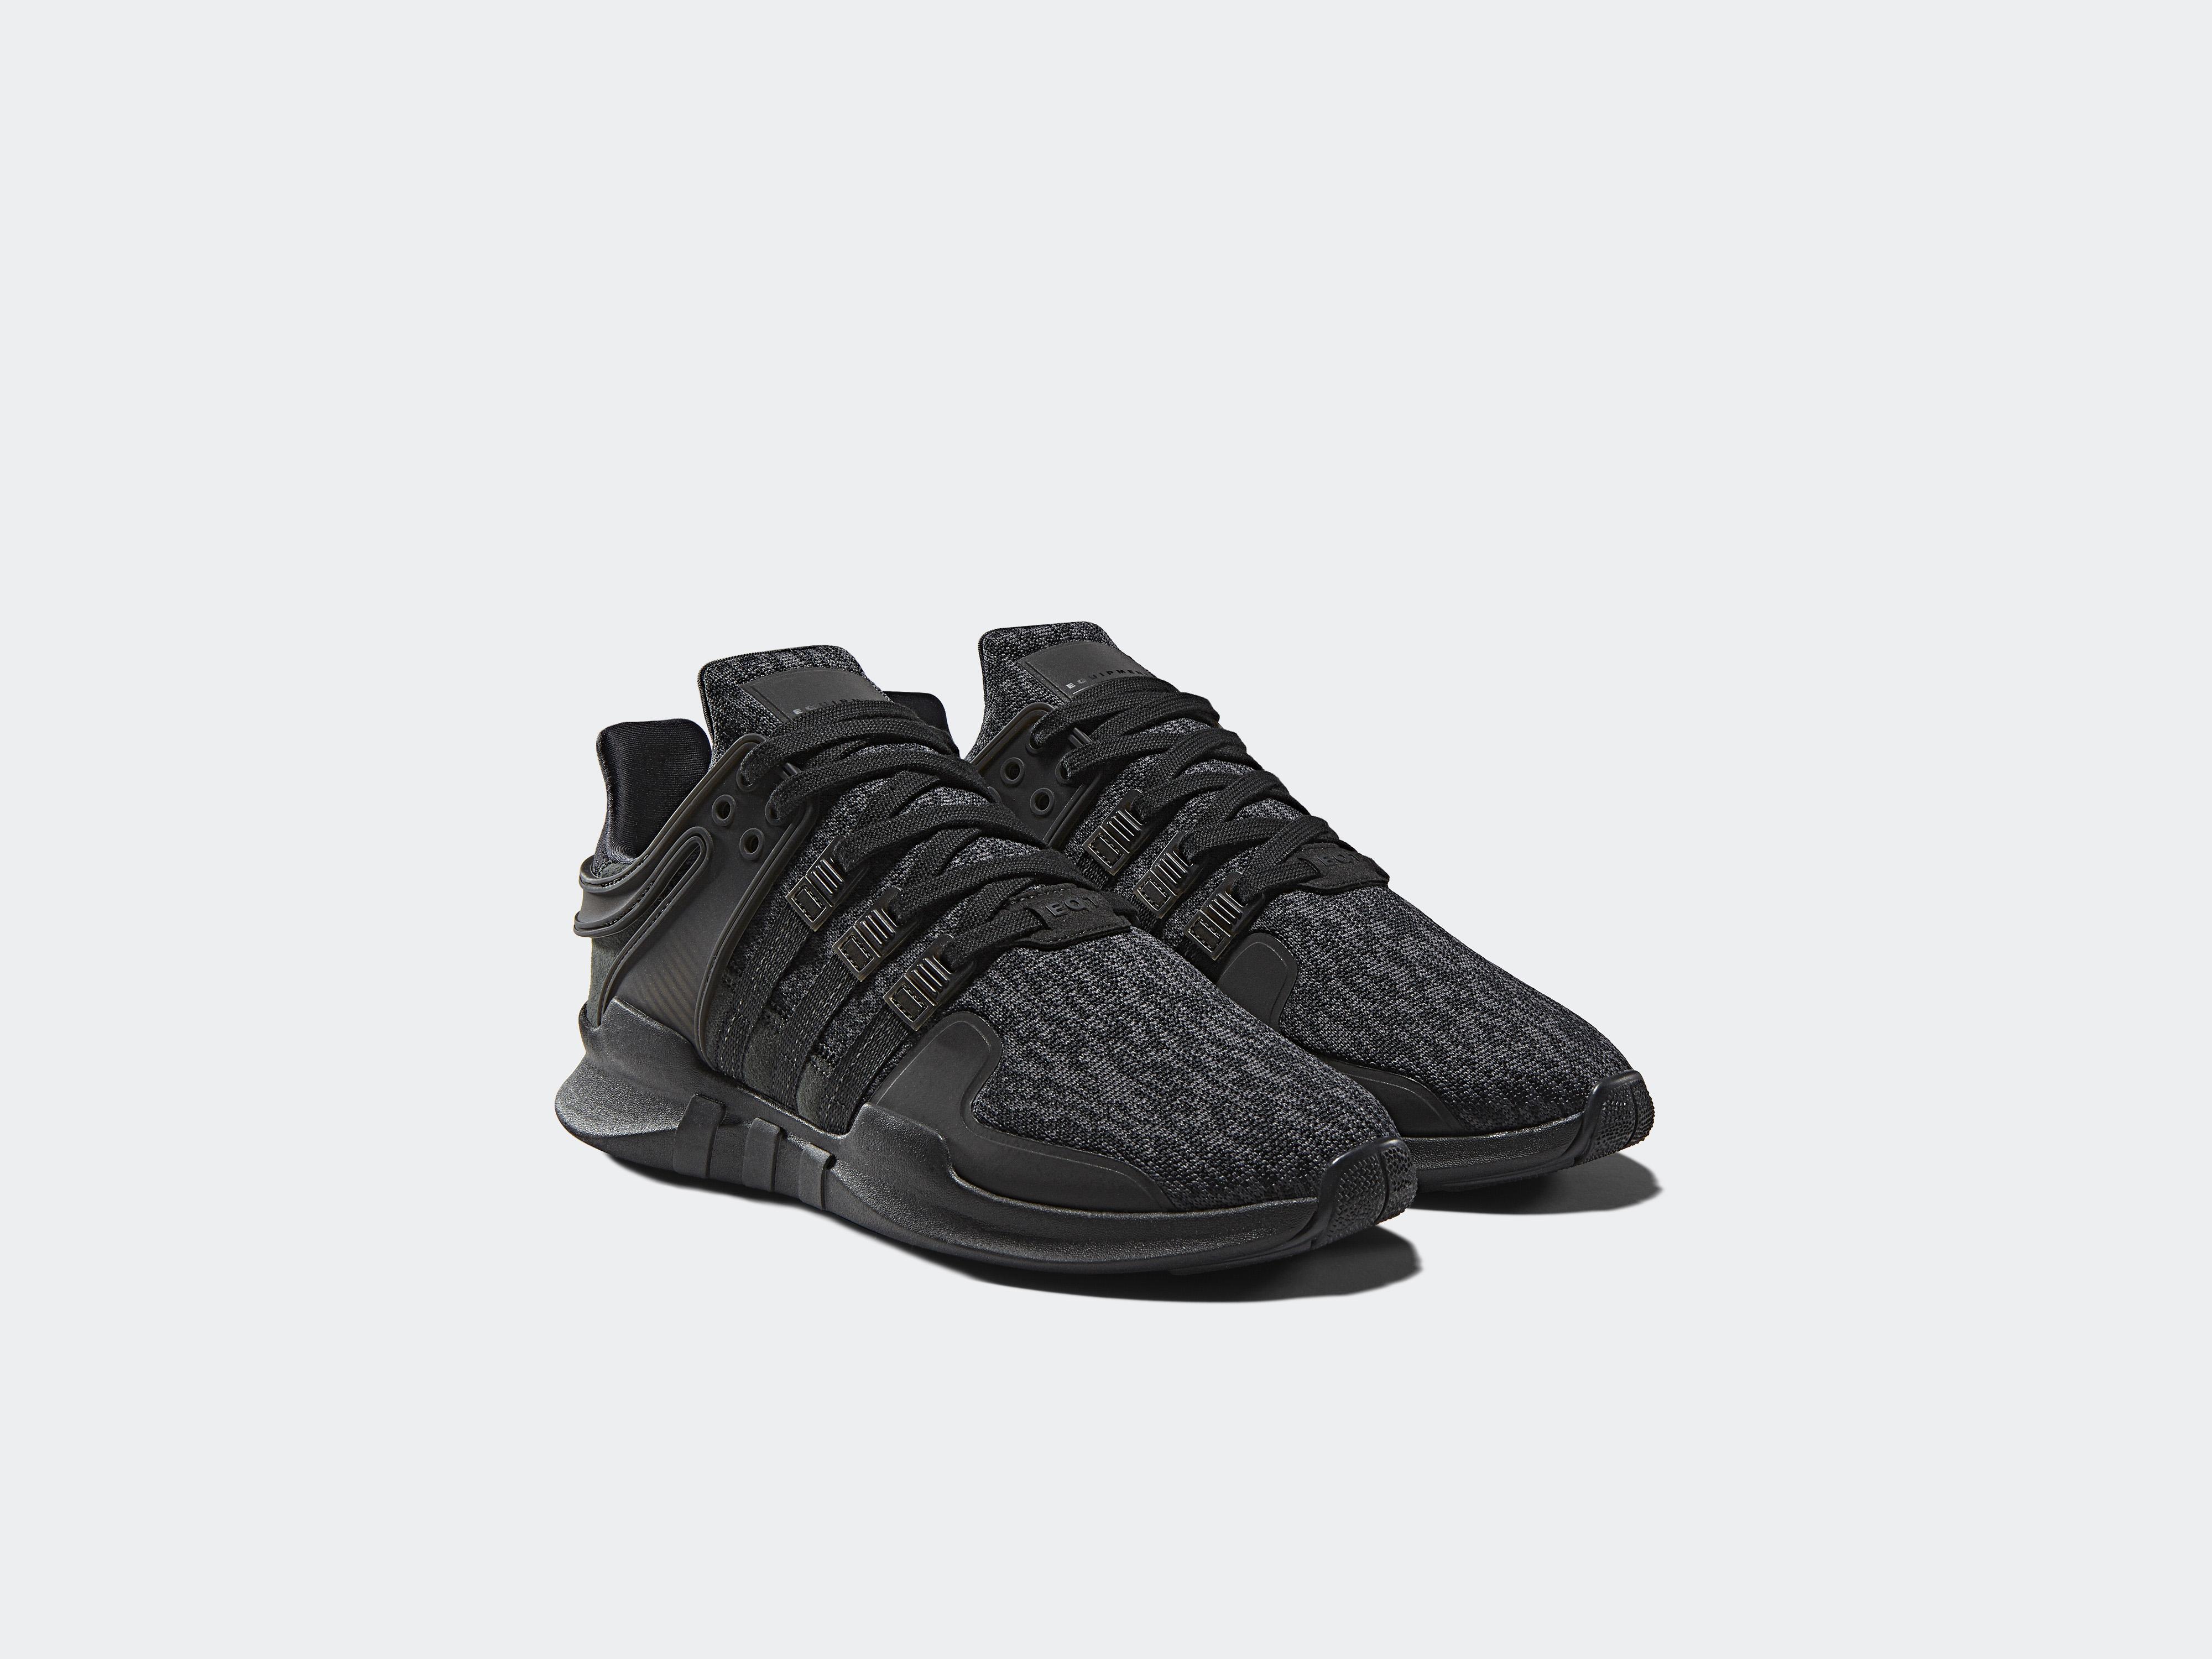 adidas eqt black friday